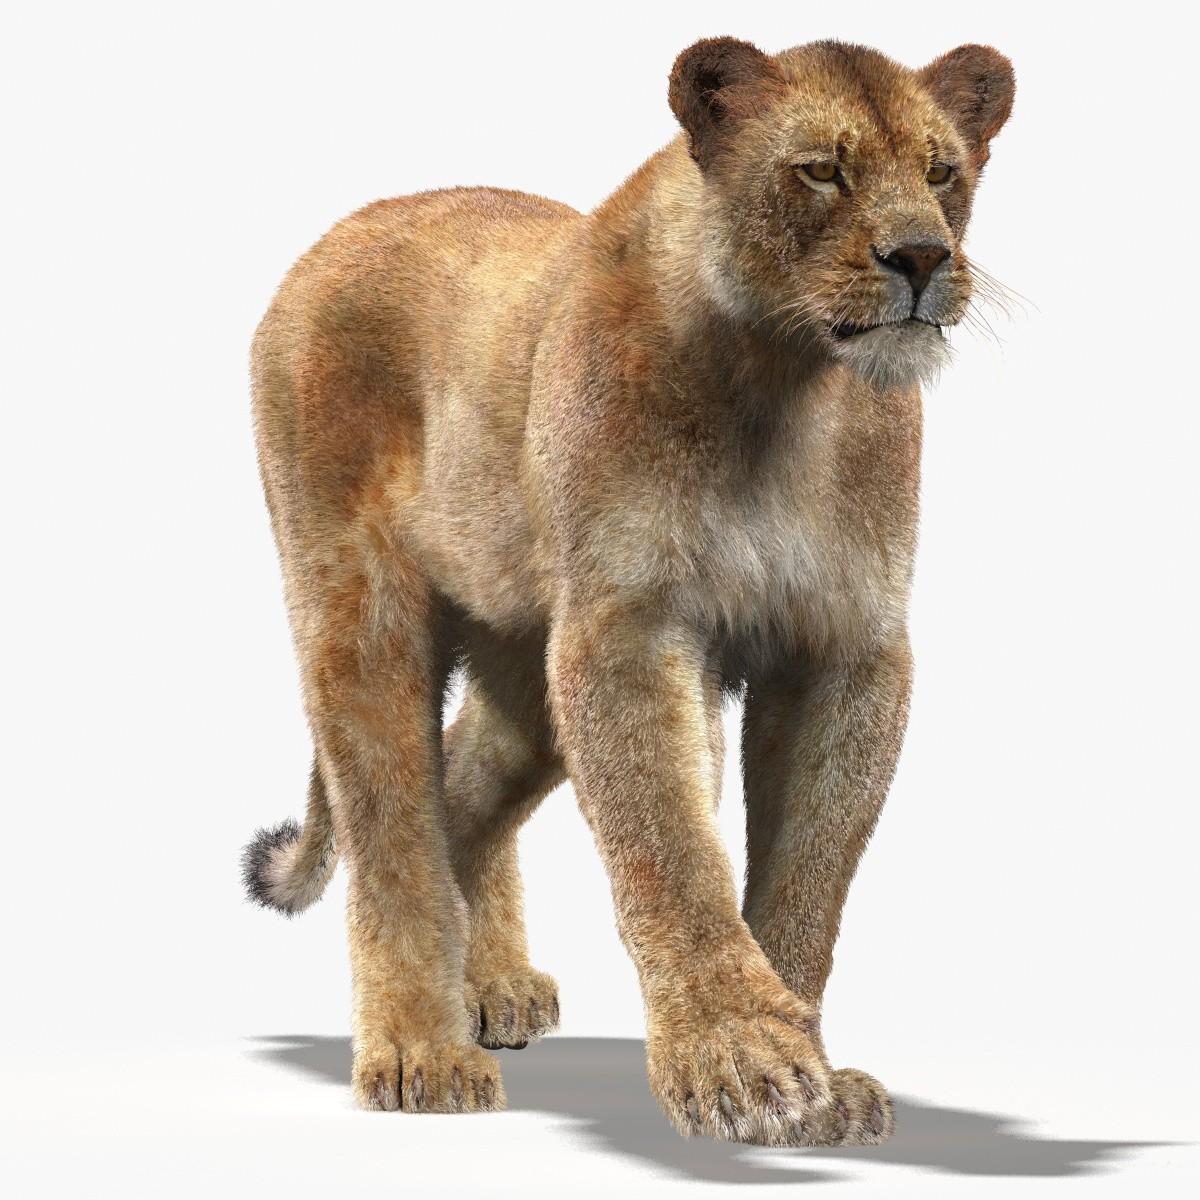 Lioness-Mental-Ray-00.jpg